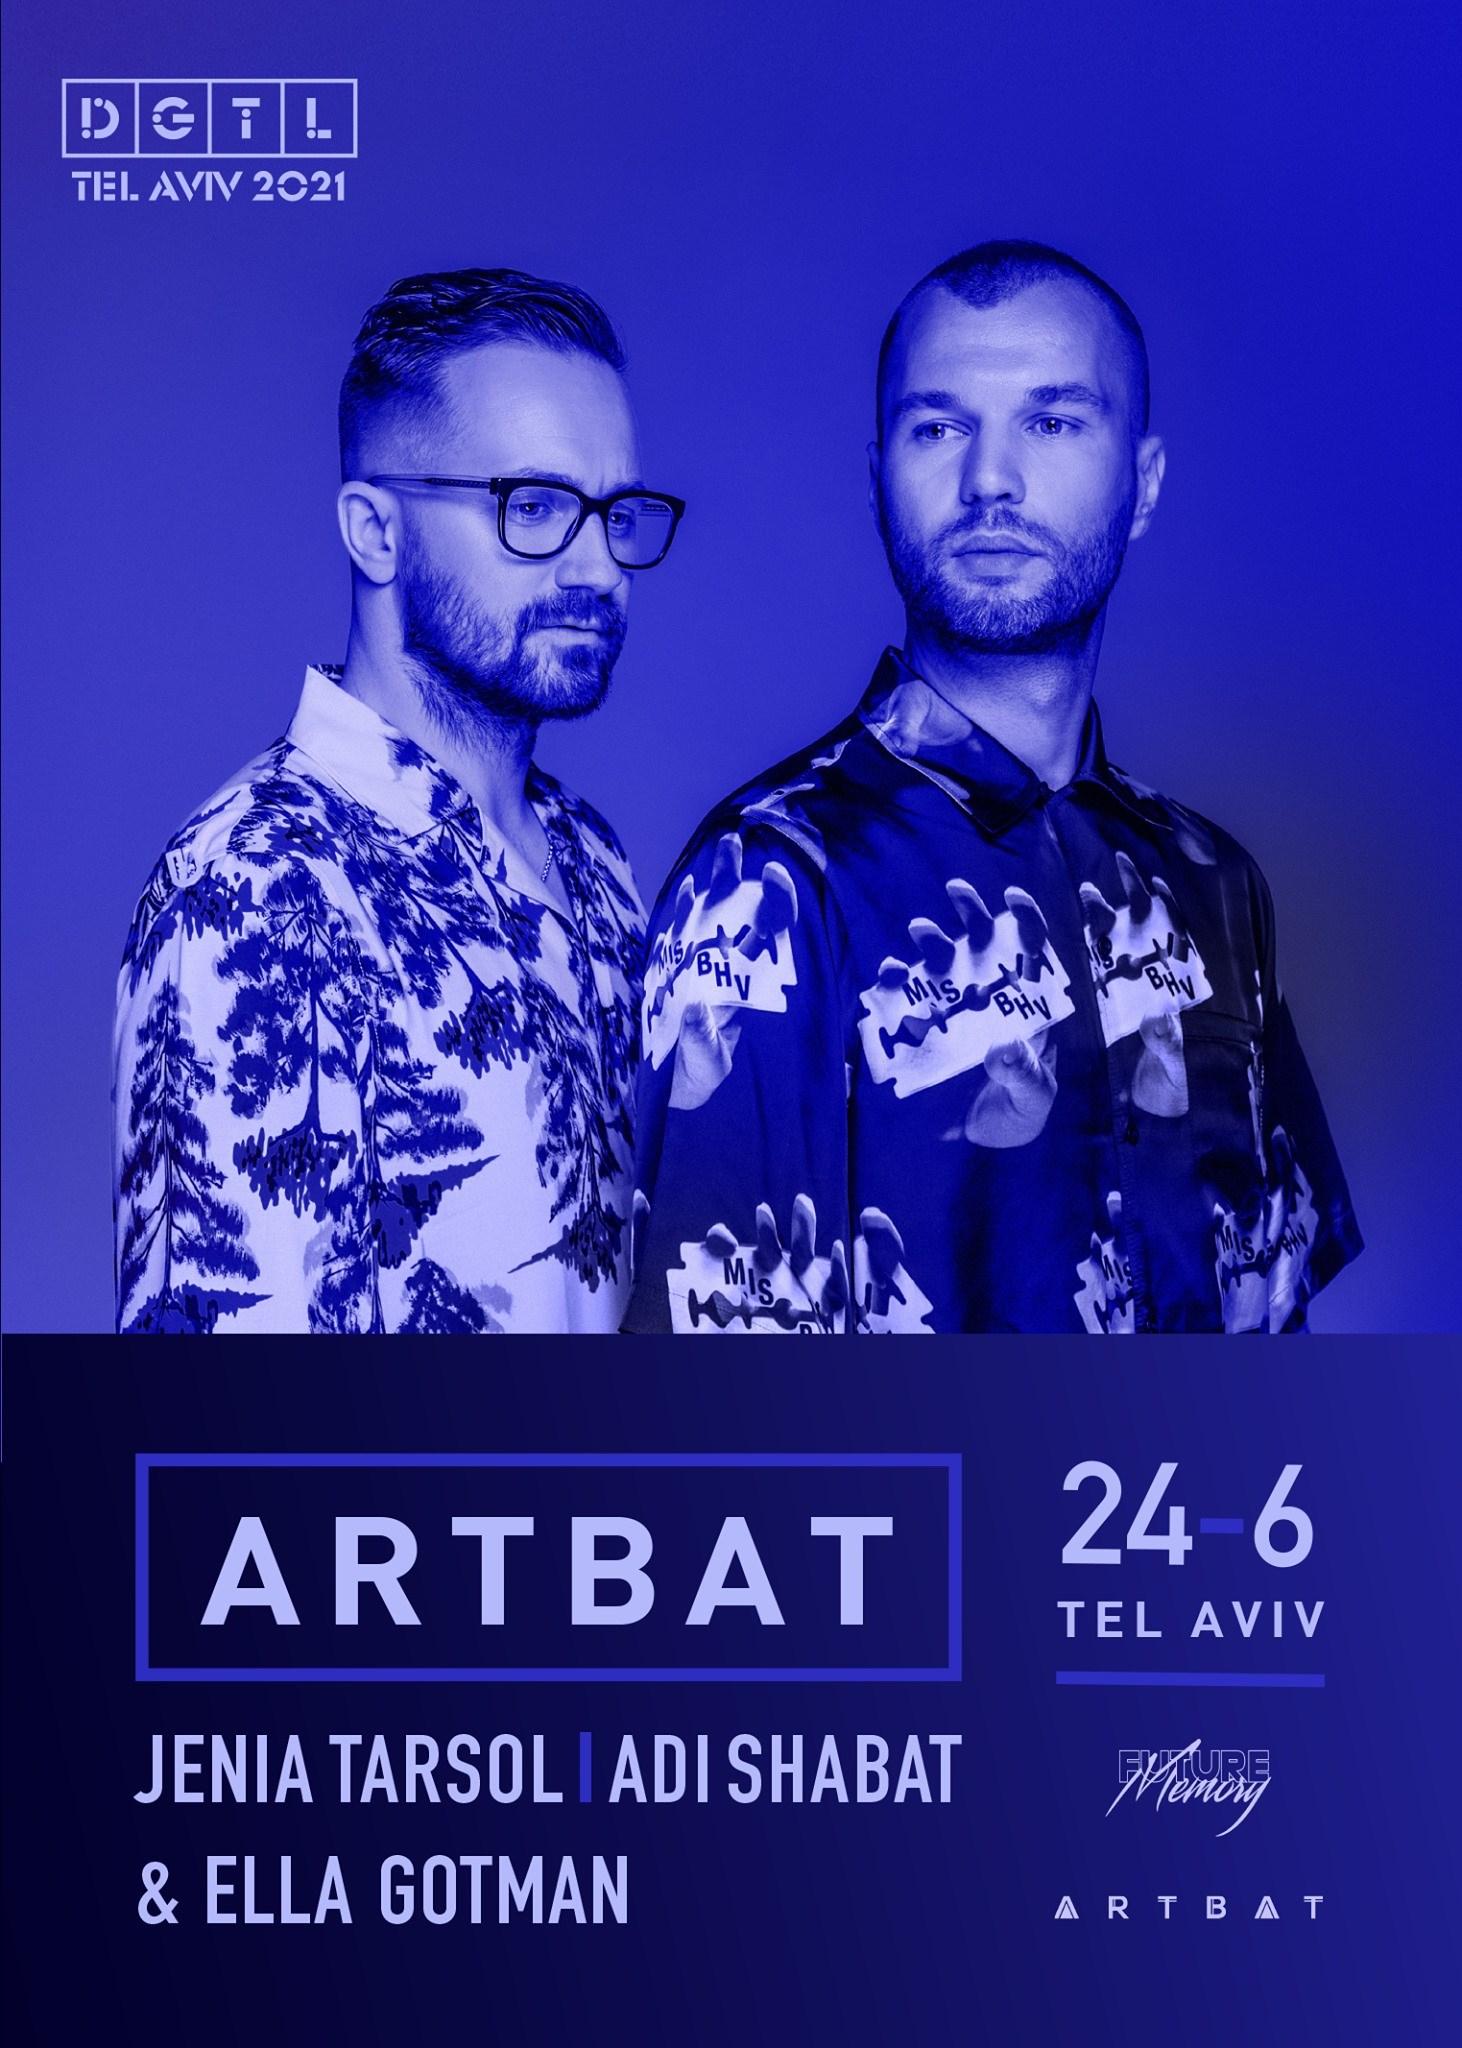 Future Memory presents: Dgtl Tel Aviv Pre Party Feat. Artbat - Flyer front